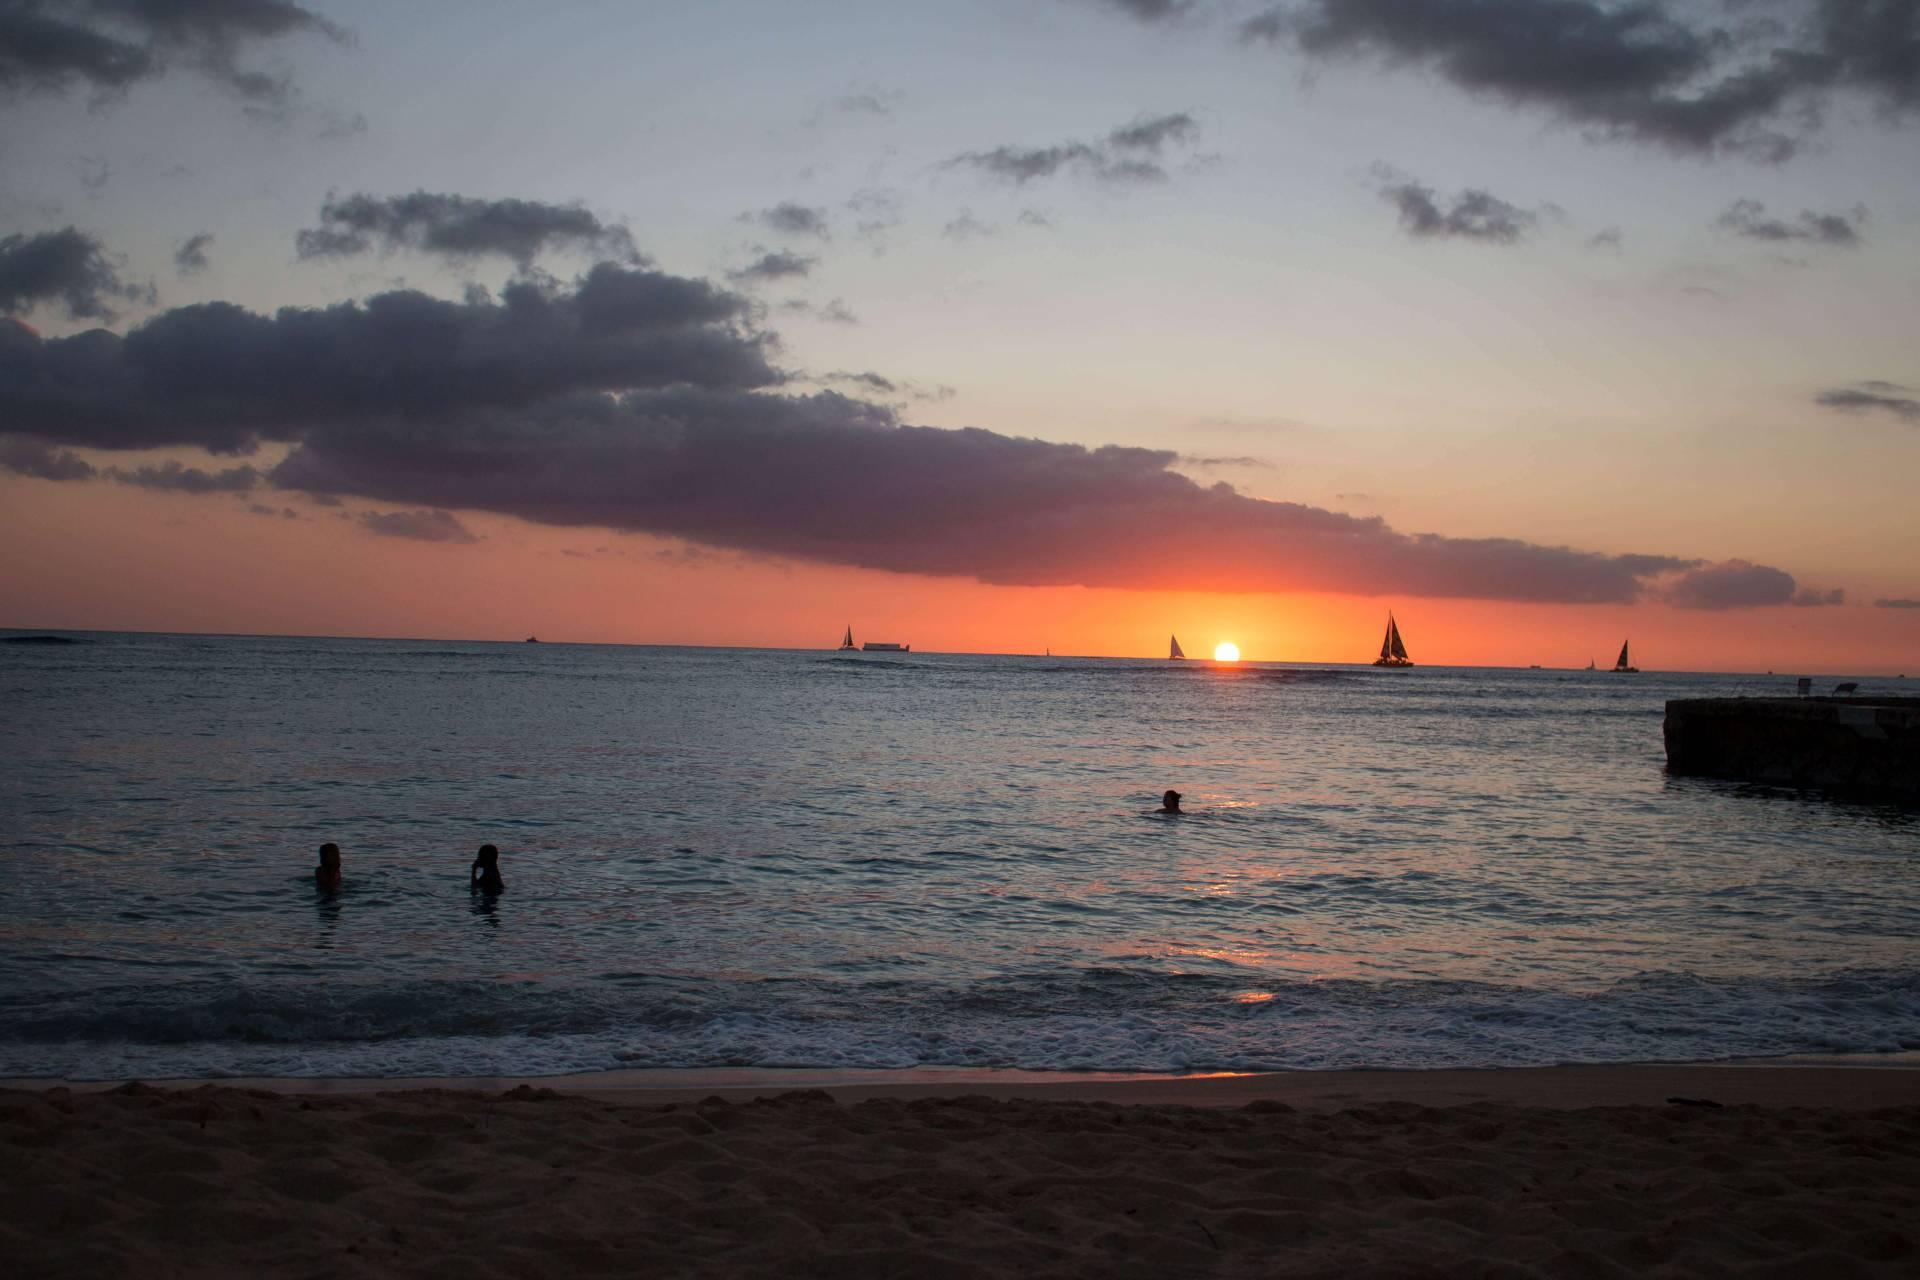 Catching the sunset from Kaimana's Beach, Oahu Hawaii